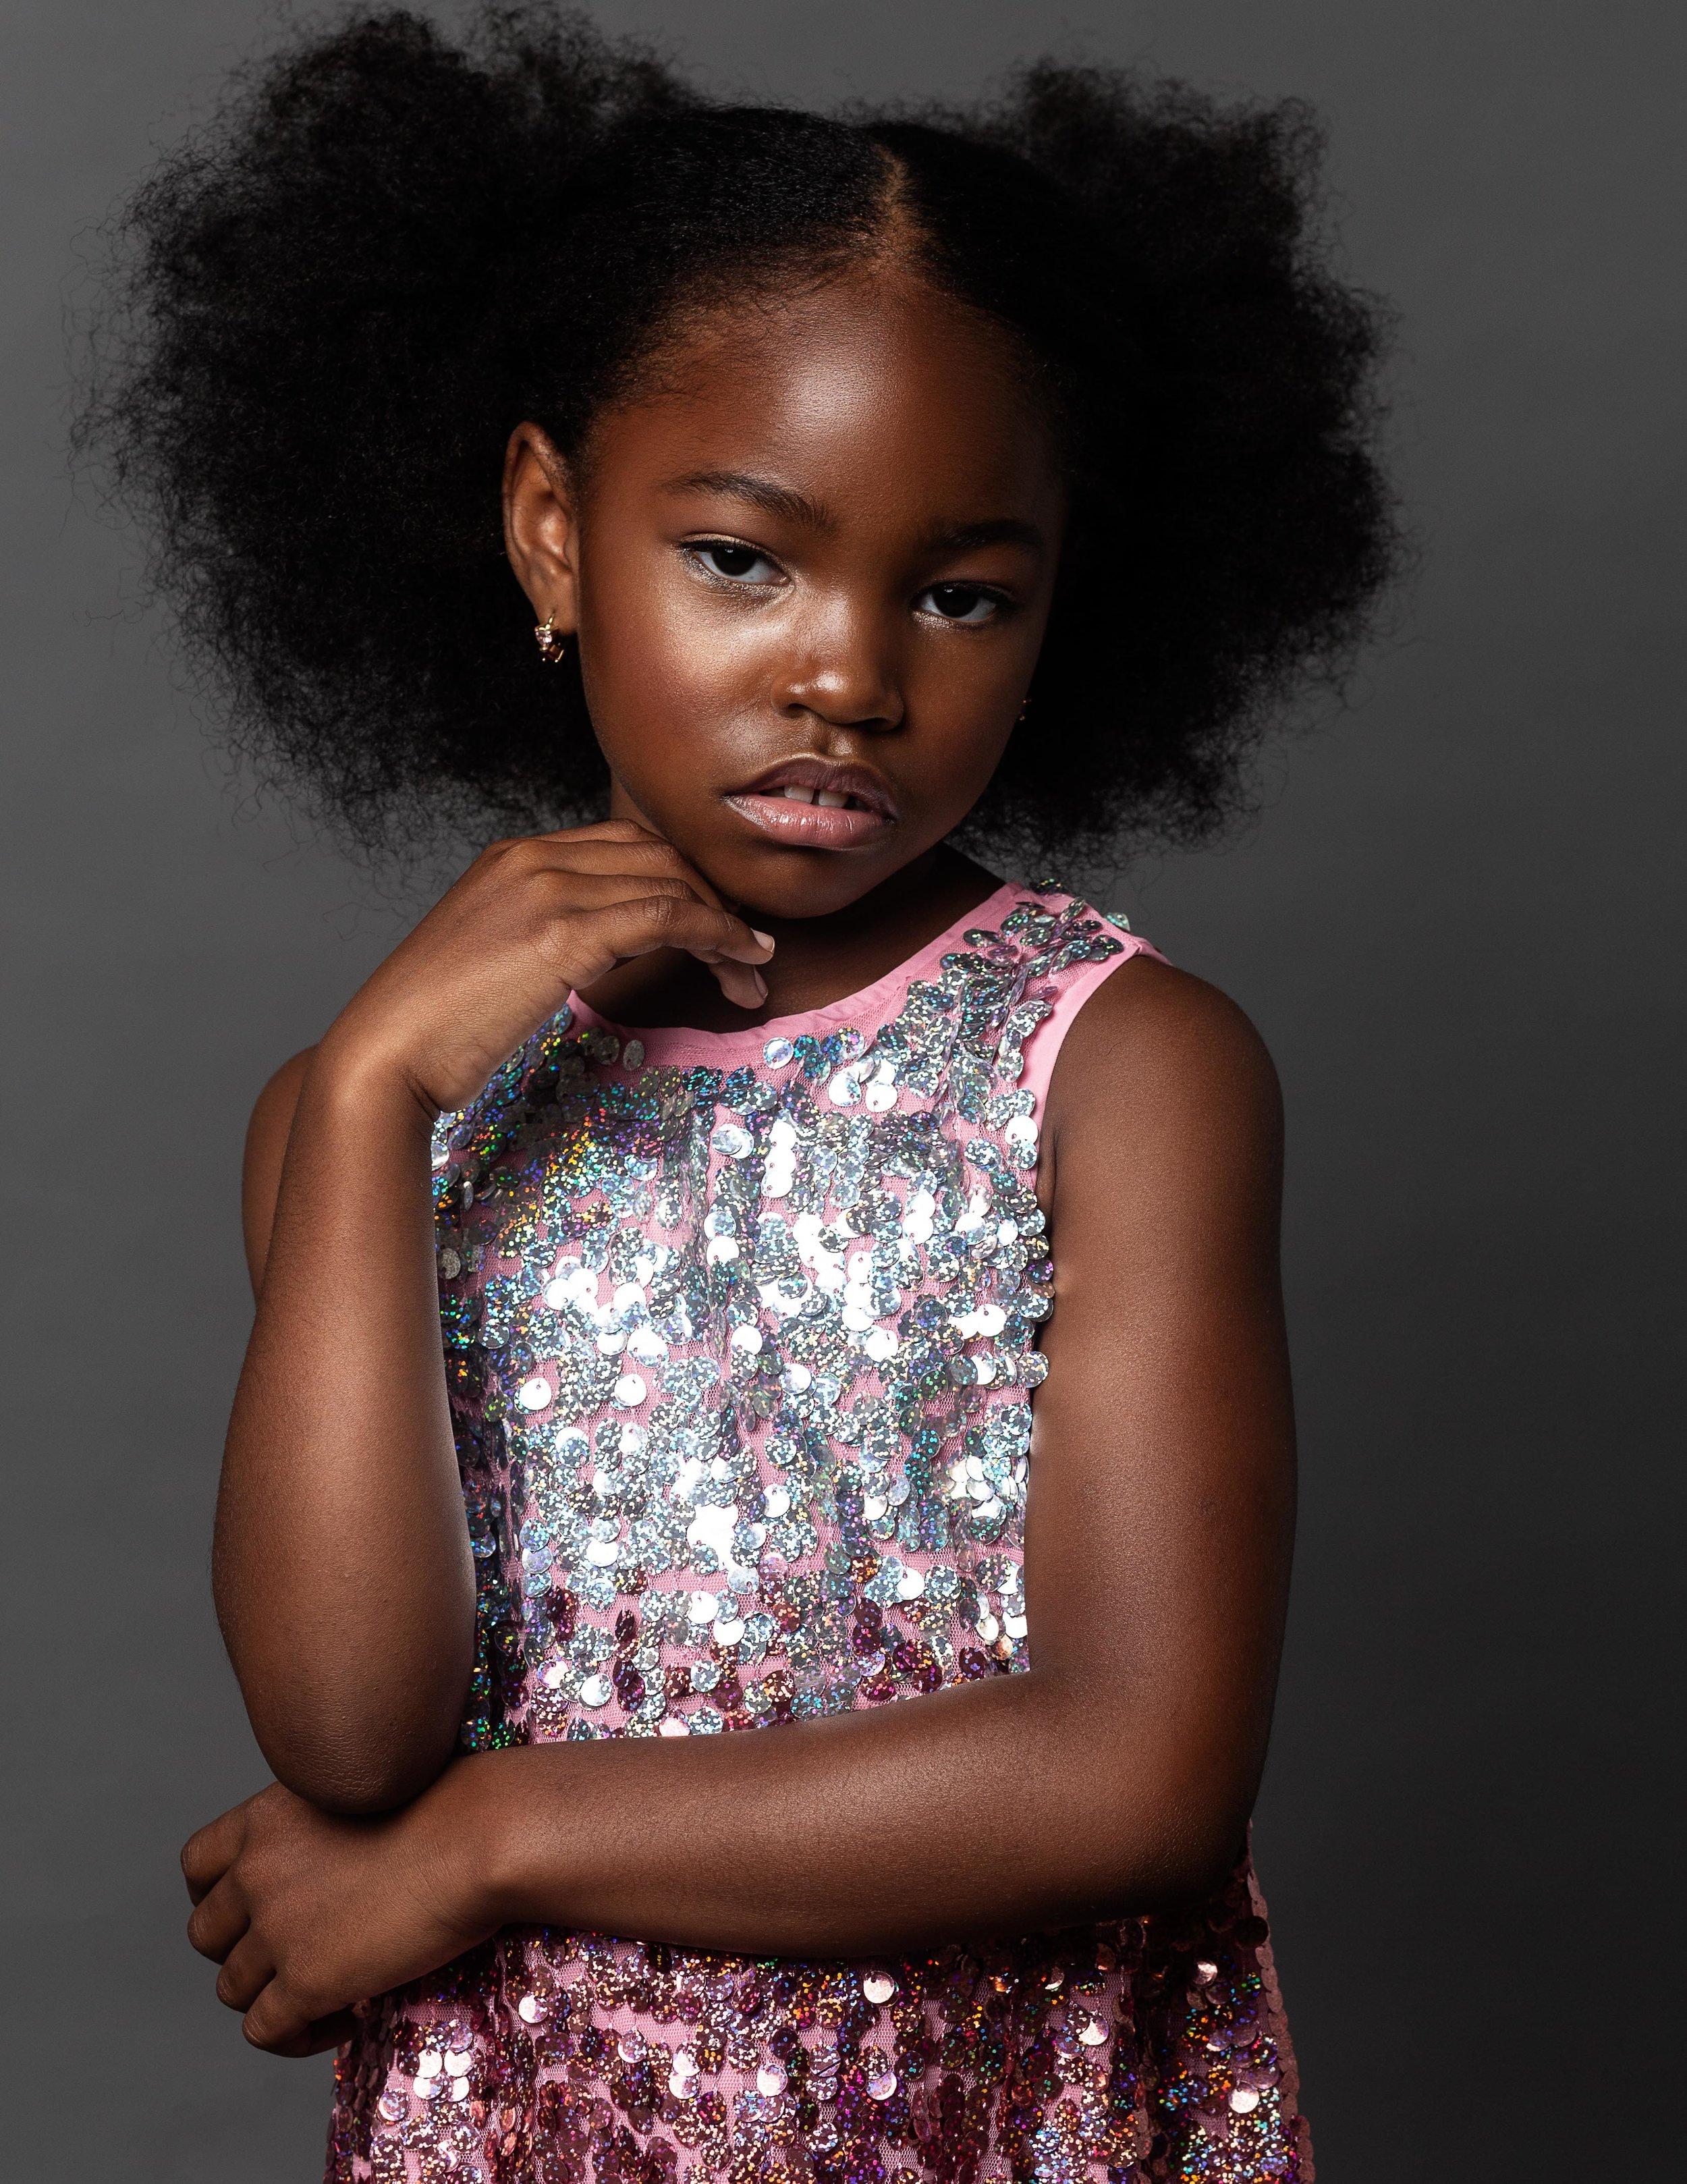 Atlanta-Ga-Teen Portraits-Ria Rouse Photography-Ka'iulani-2.jpg